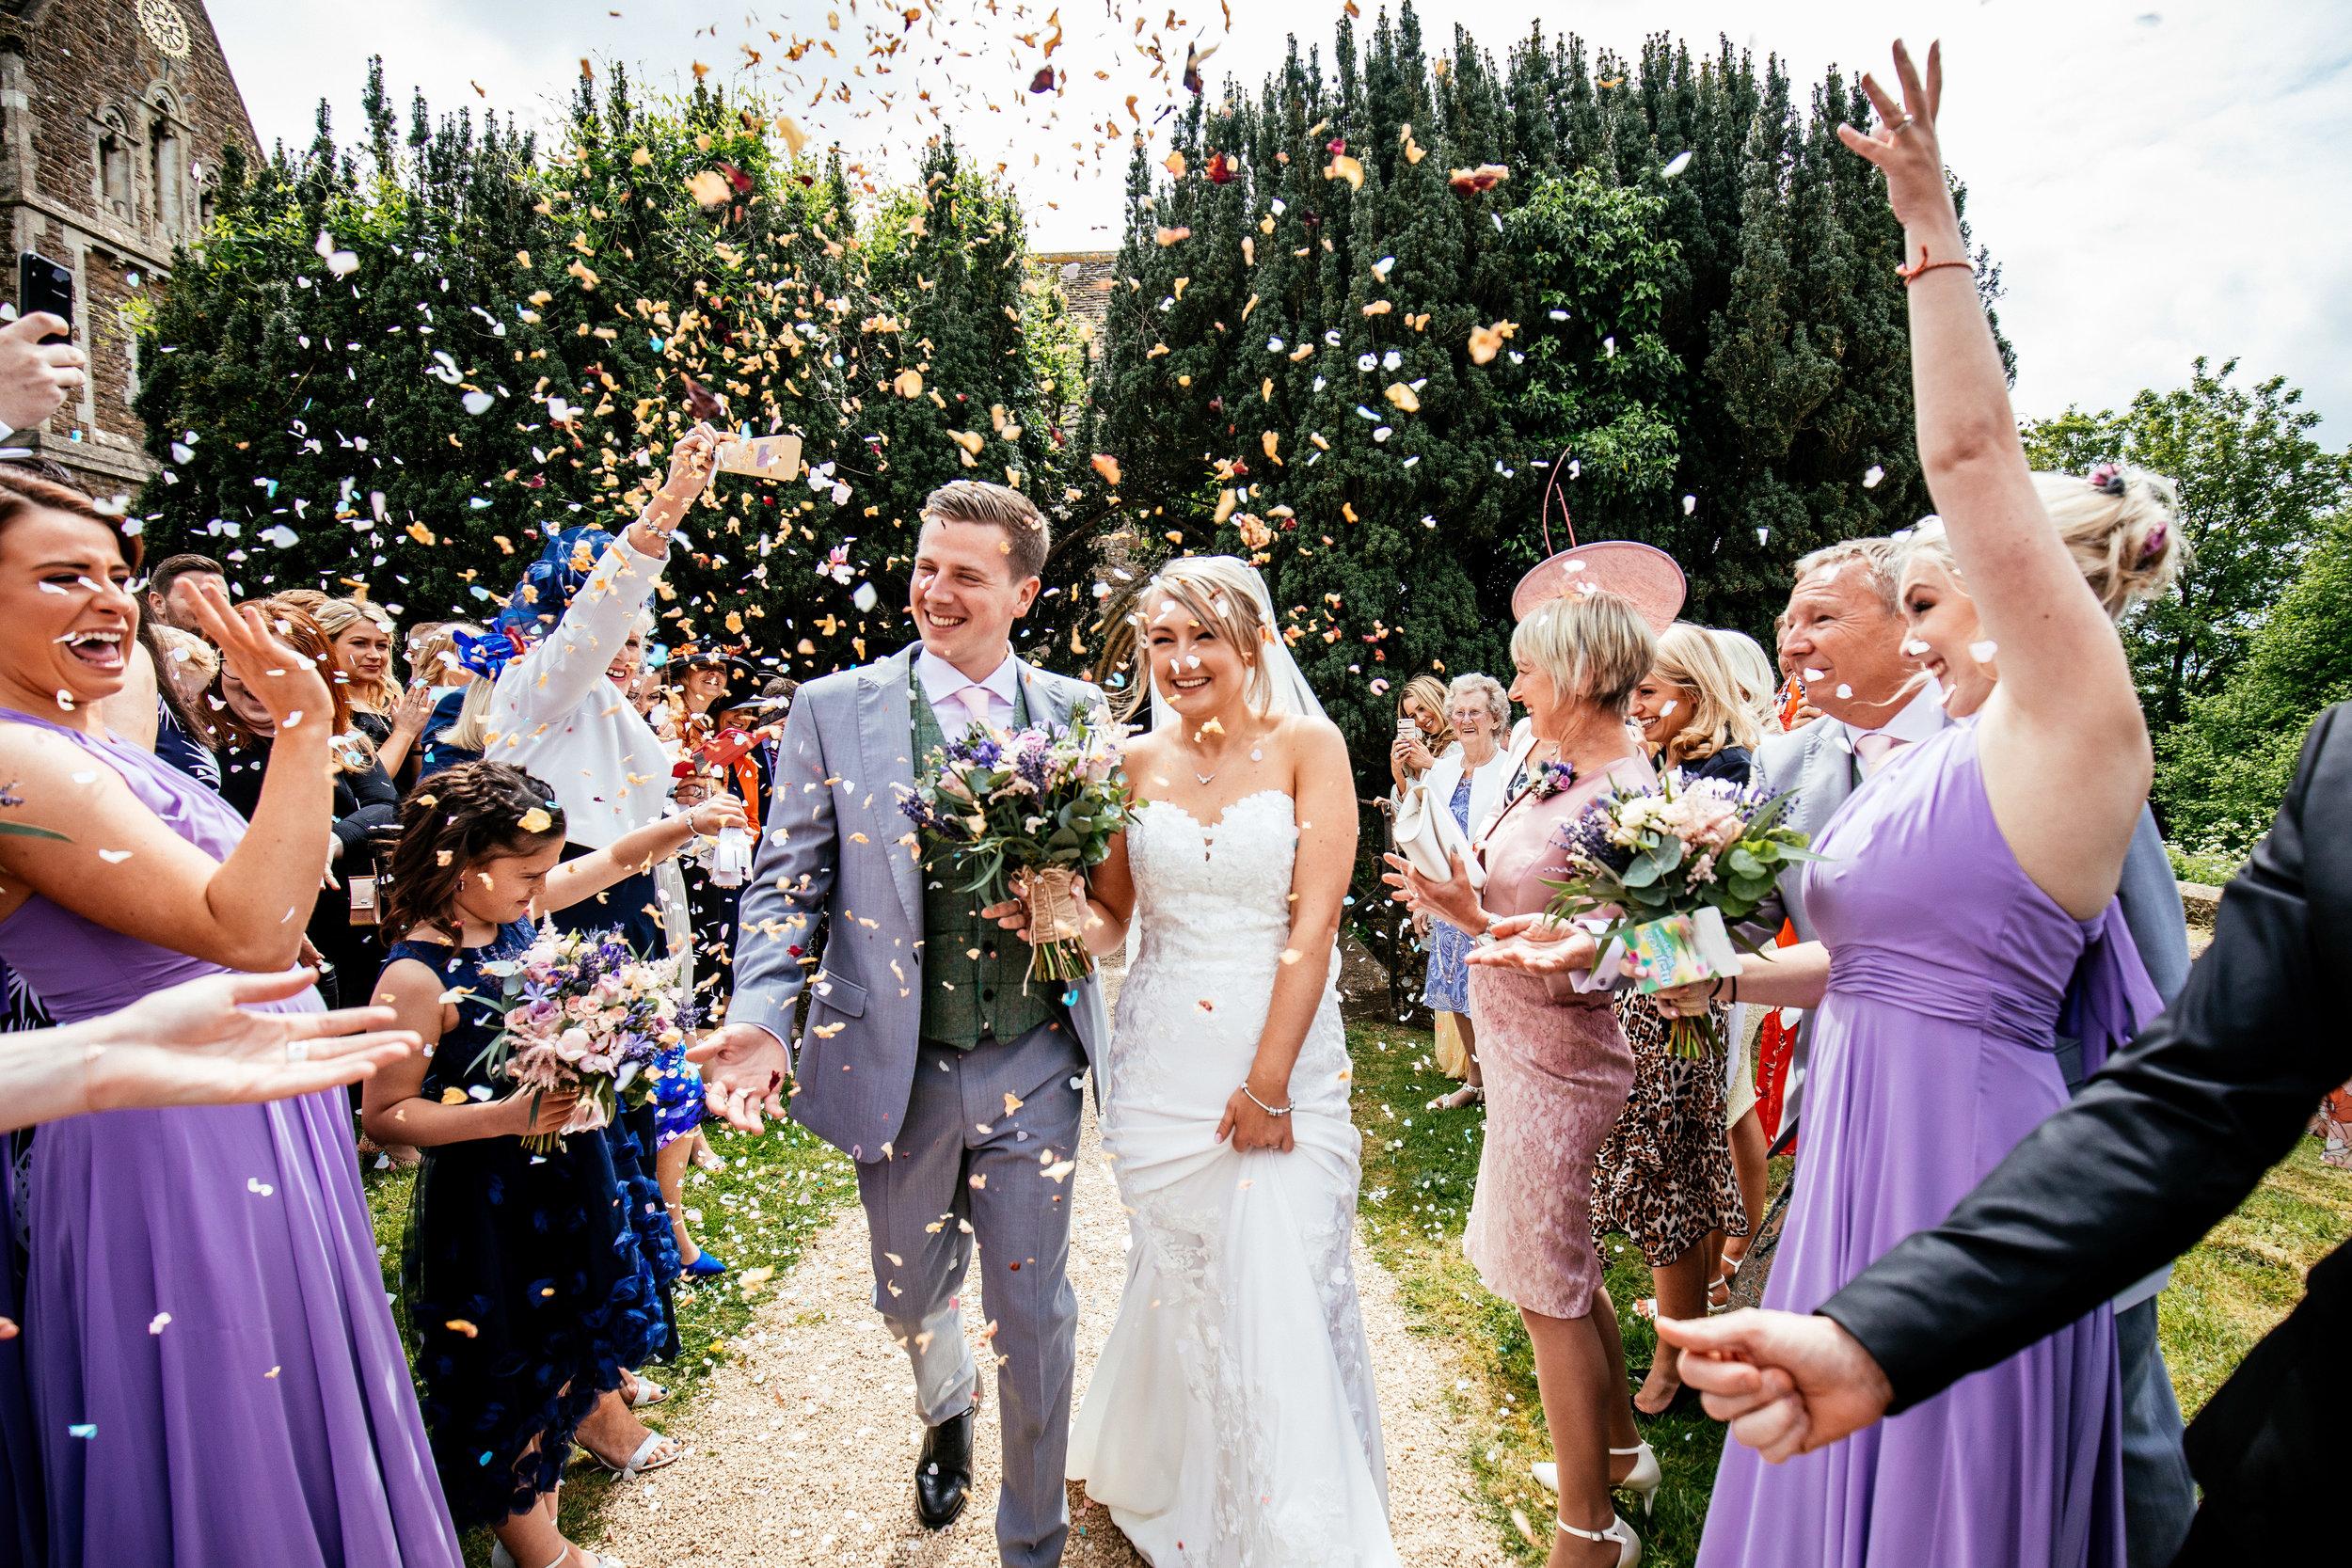 Becky-and-Sam-Wedding-Highlights-26.jpg